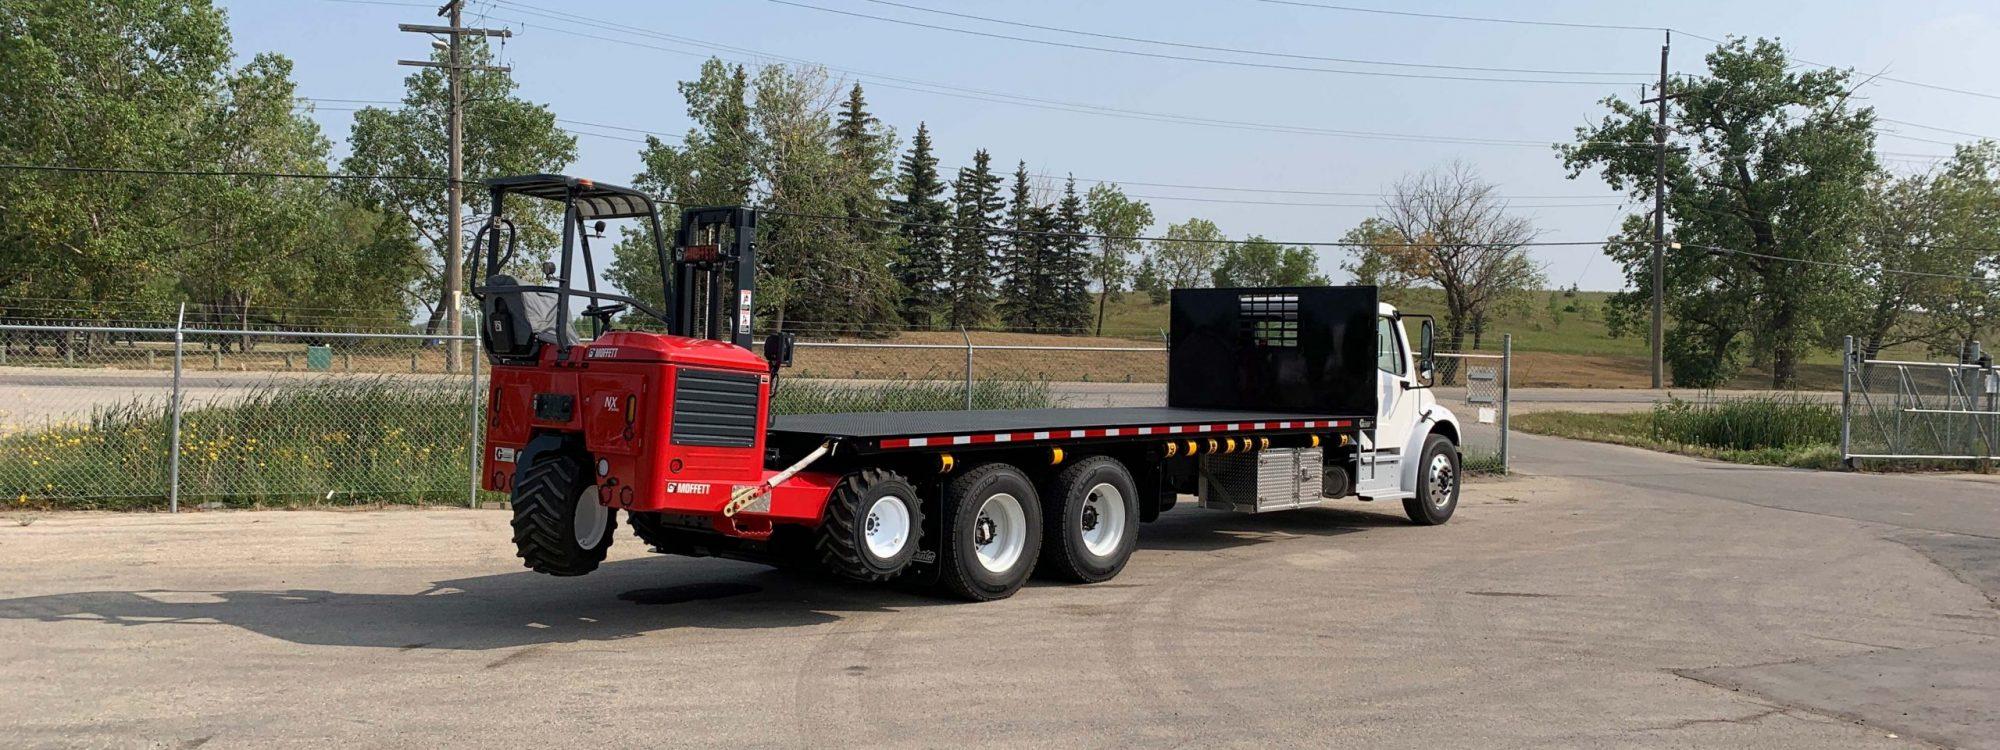 Deck-truck-with-moffett